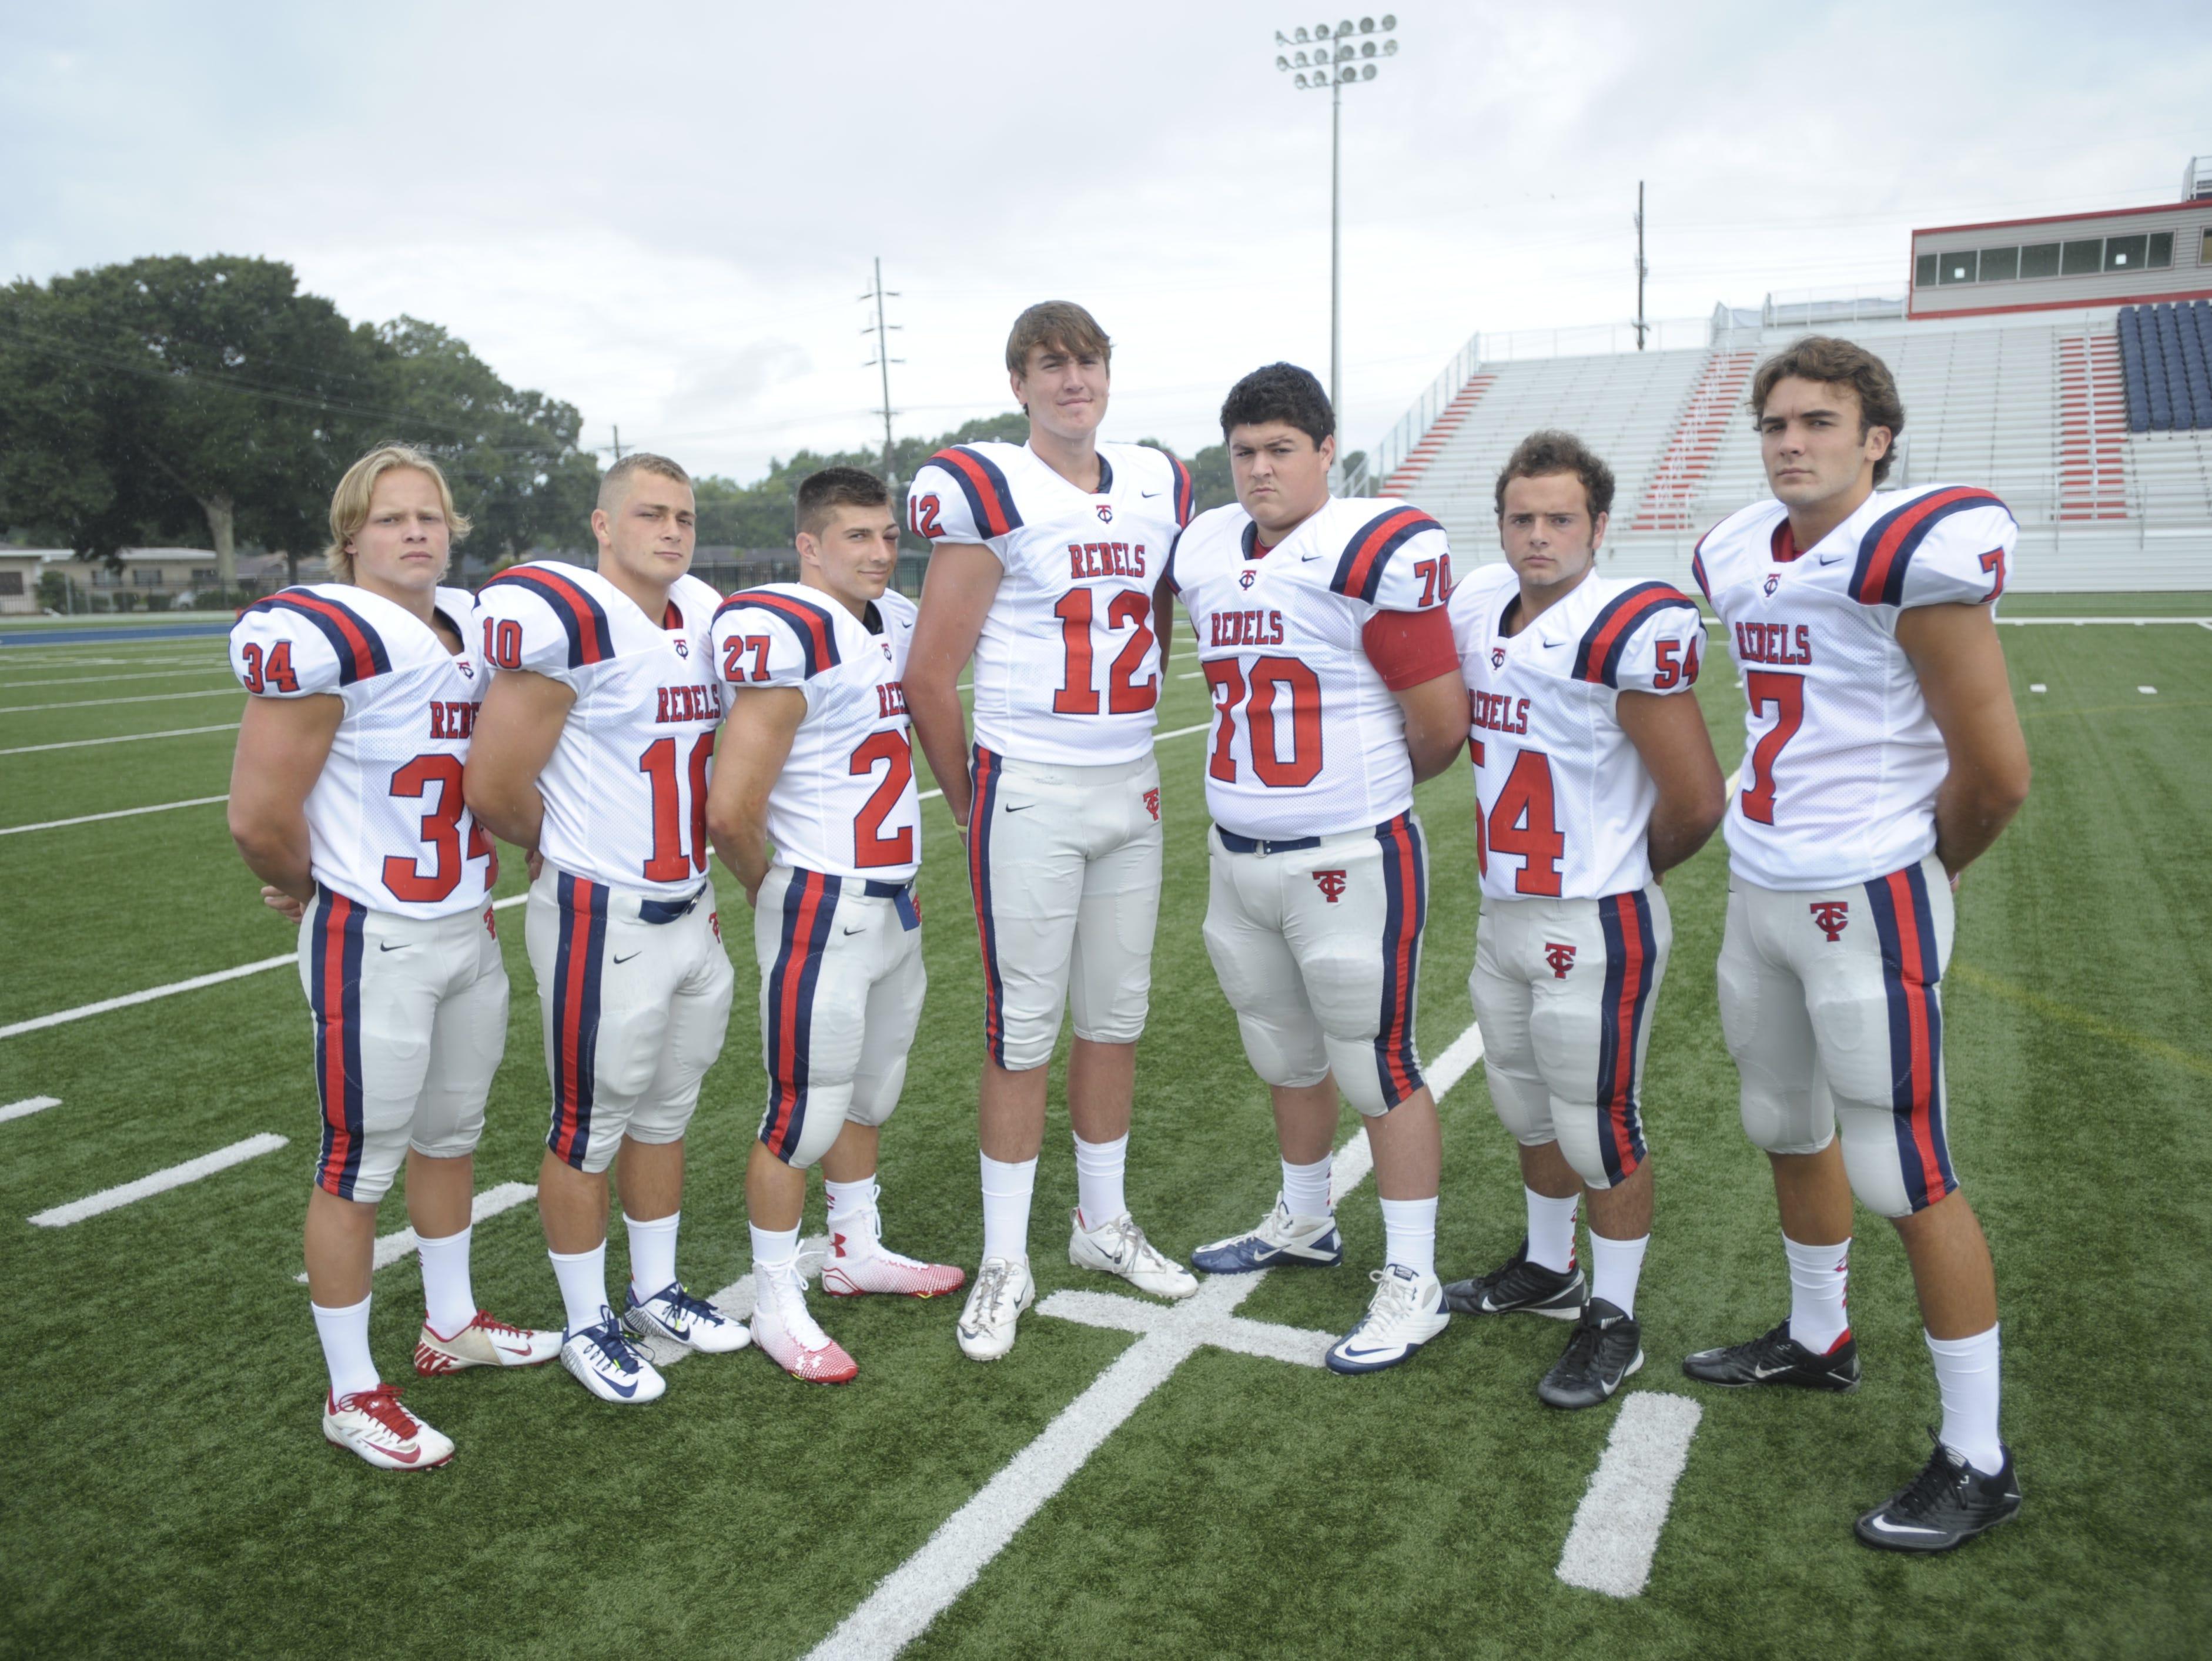 Teurlings Catholic's offensive leaders include Baylor Thompson (34), Jacob Landry (10), Noah Harris (27), Cole Kelley (12), Brilan Degeyter (70), Zachary Ashy (54) and Nate Arceneaux (7).